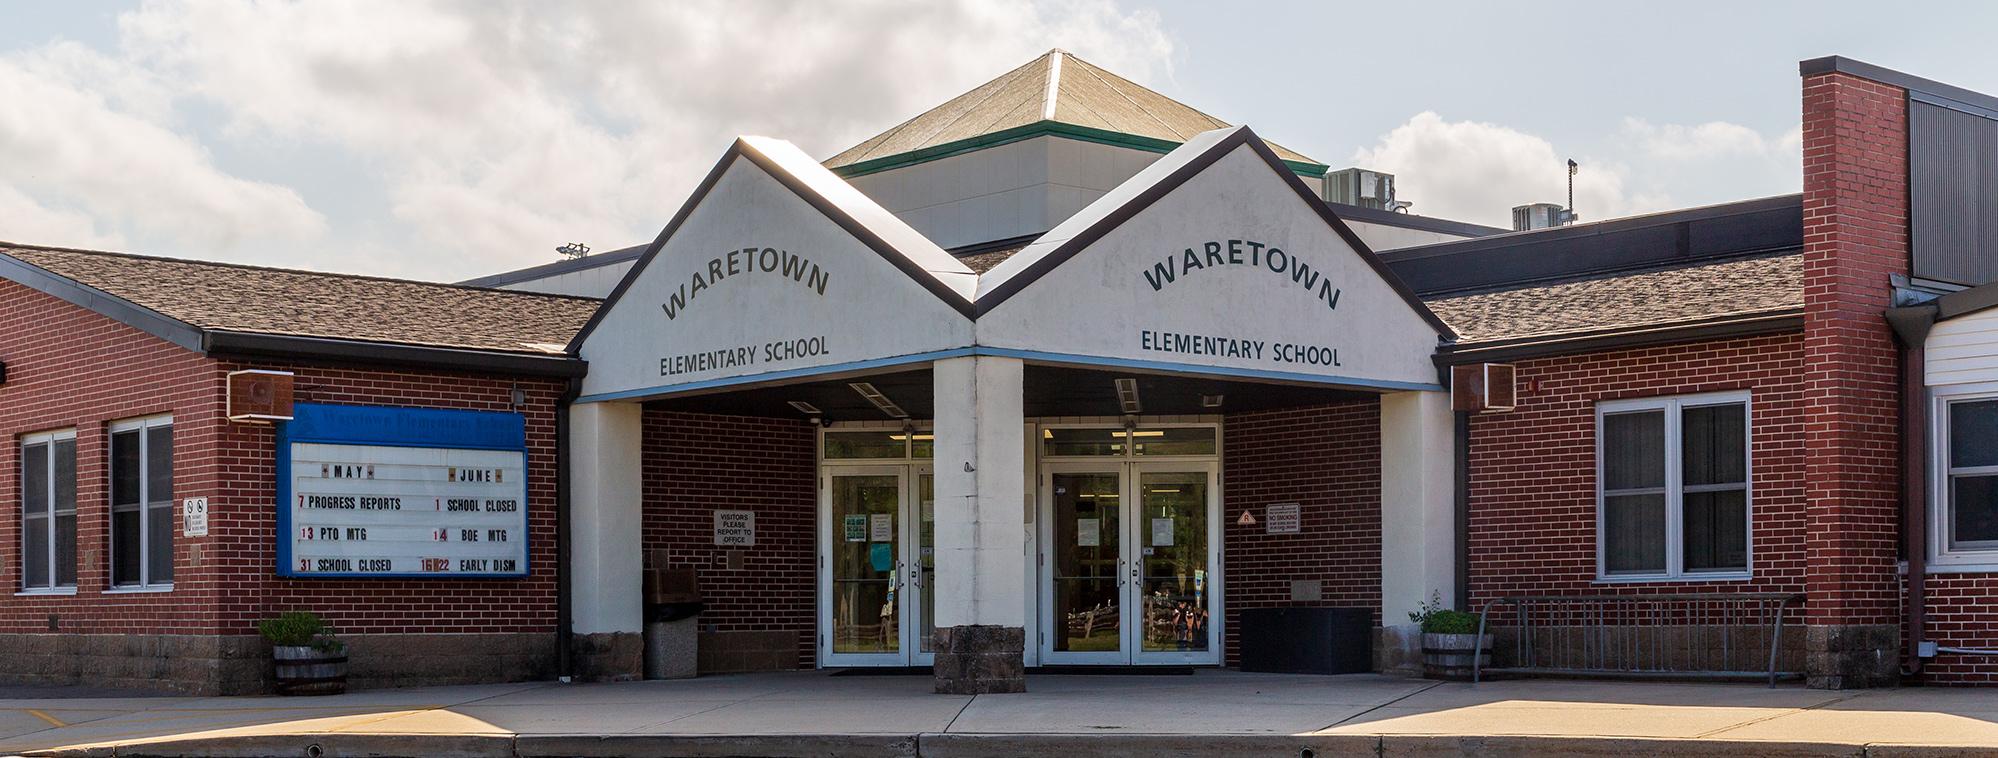 Waretown Elementary School